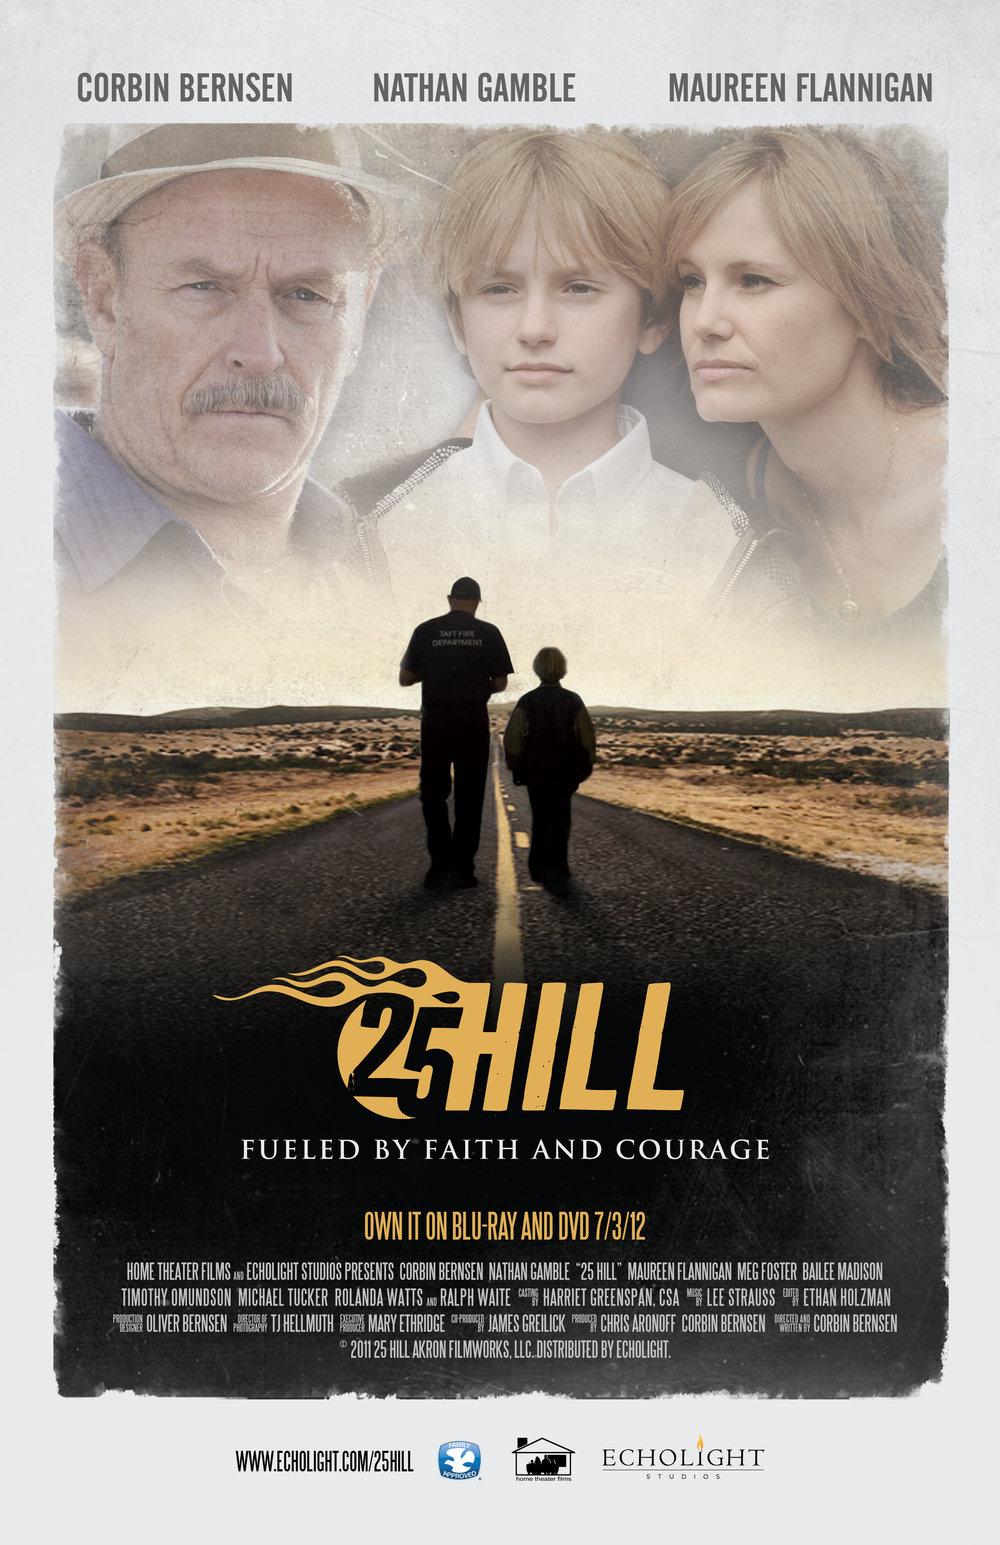 25hill poster.jpg